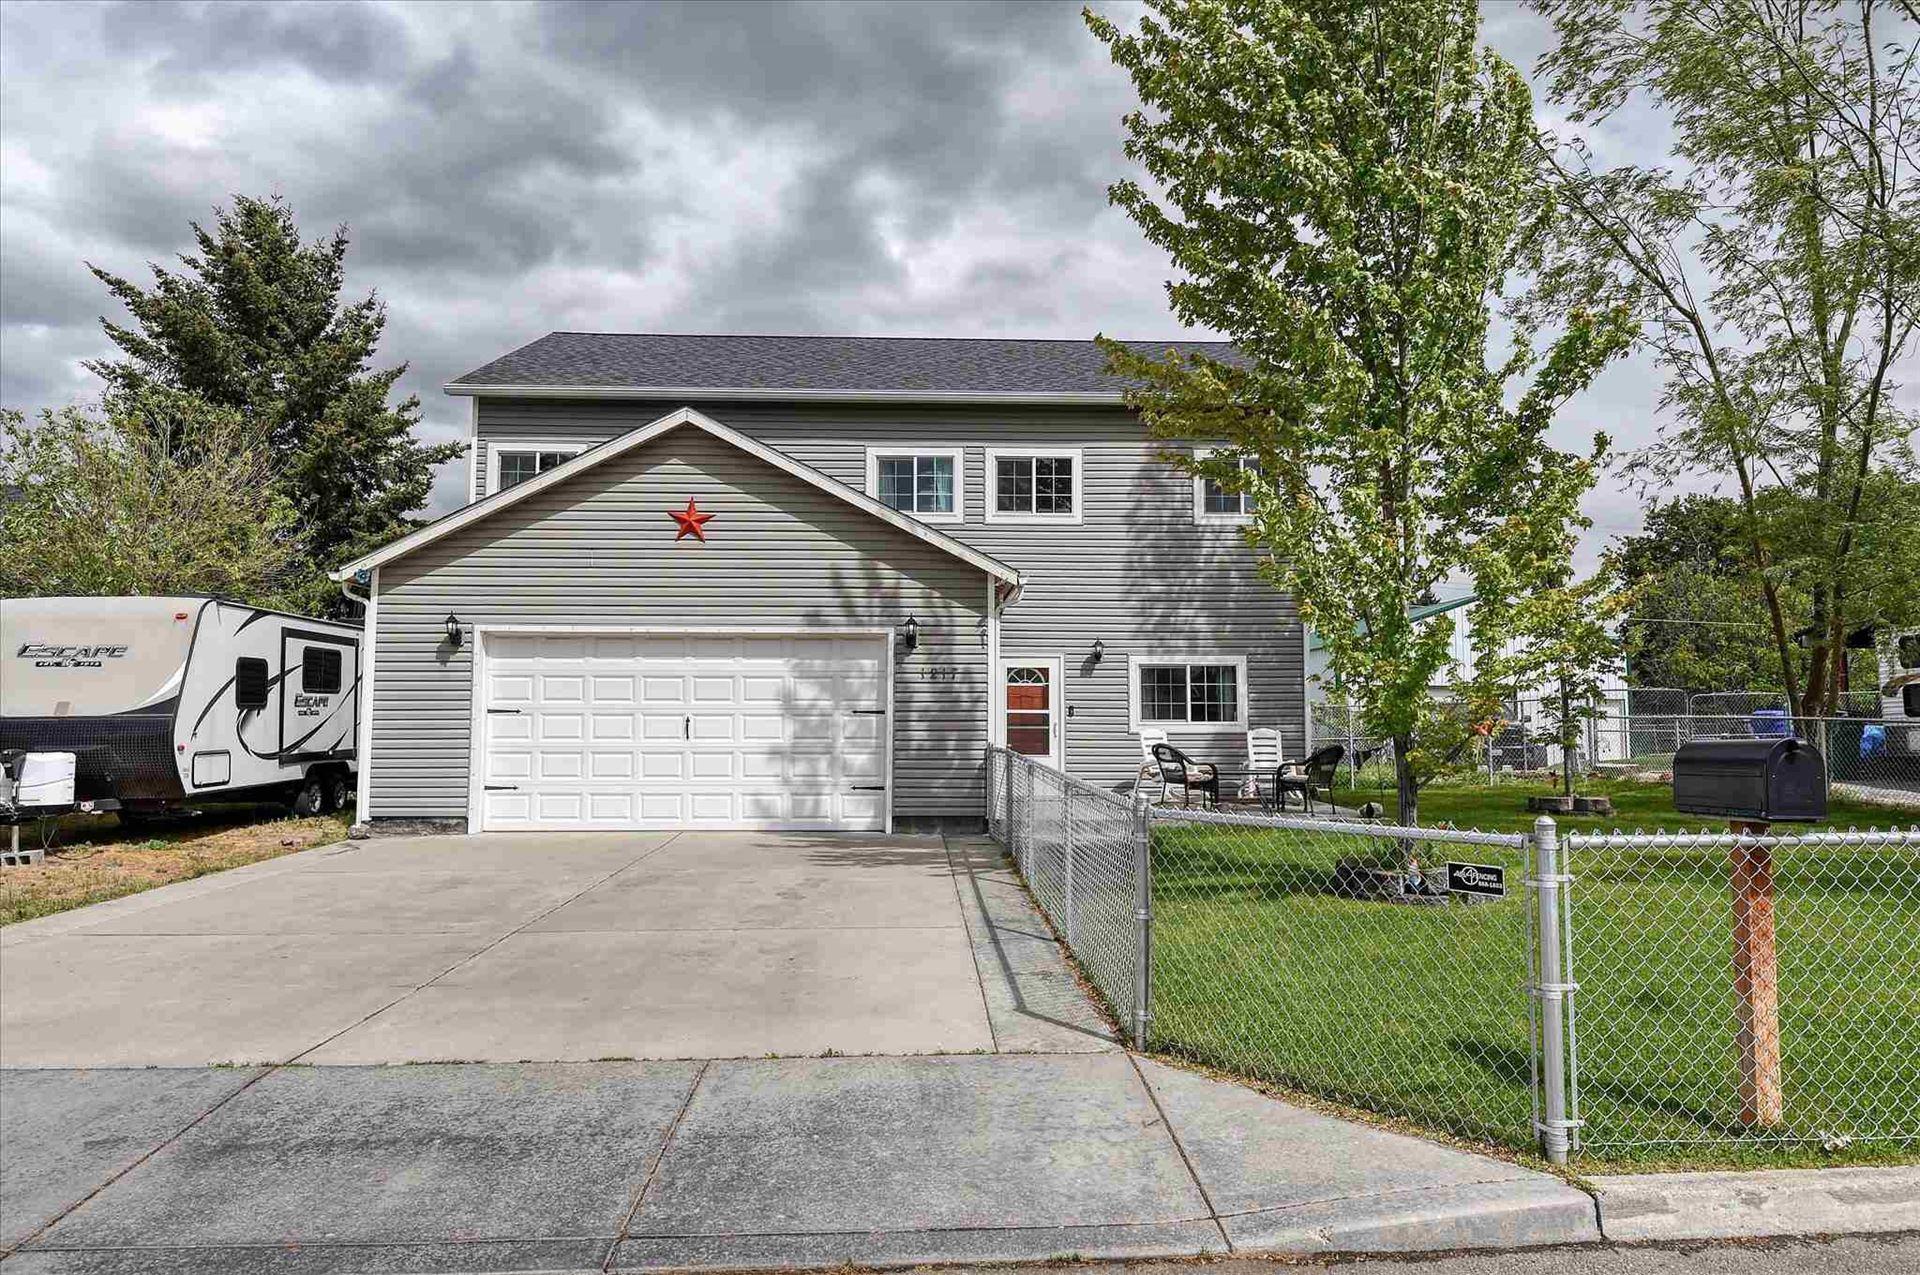 1217 S Fox Rd, Spokane Valley, WA 99206-6140 - #: 202116308